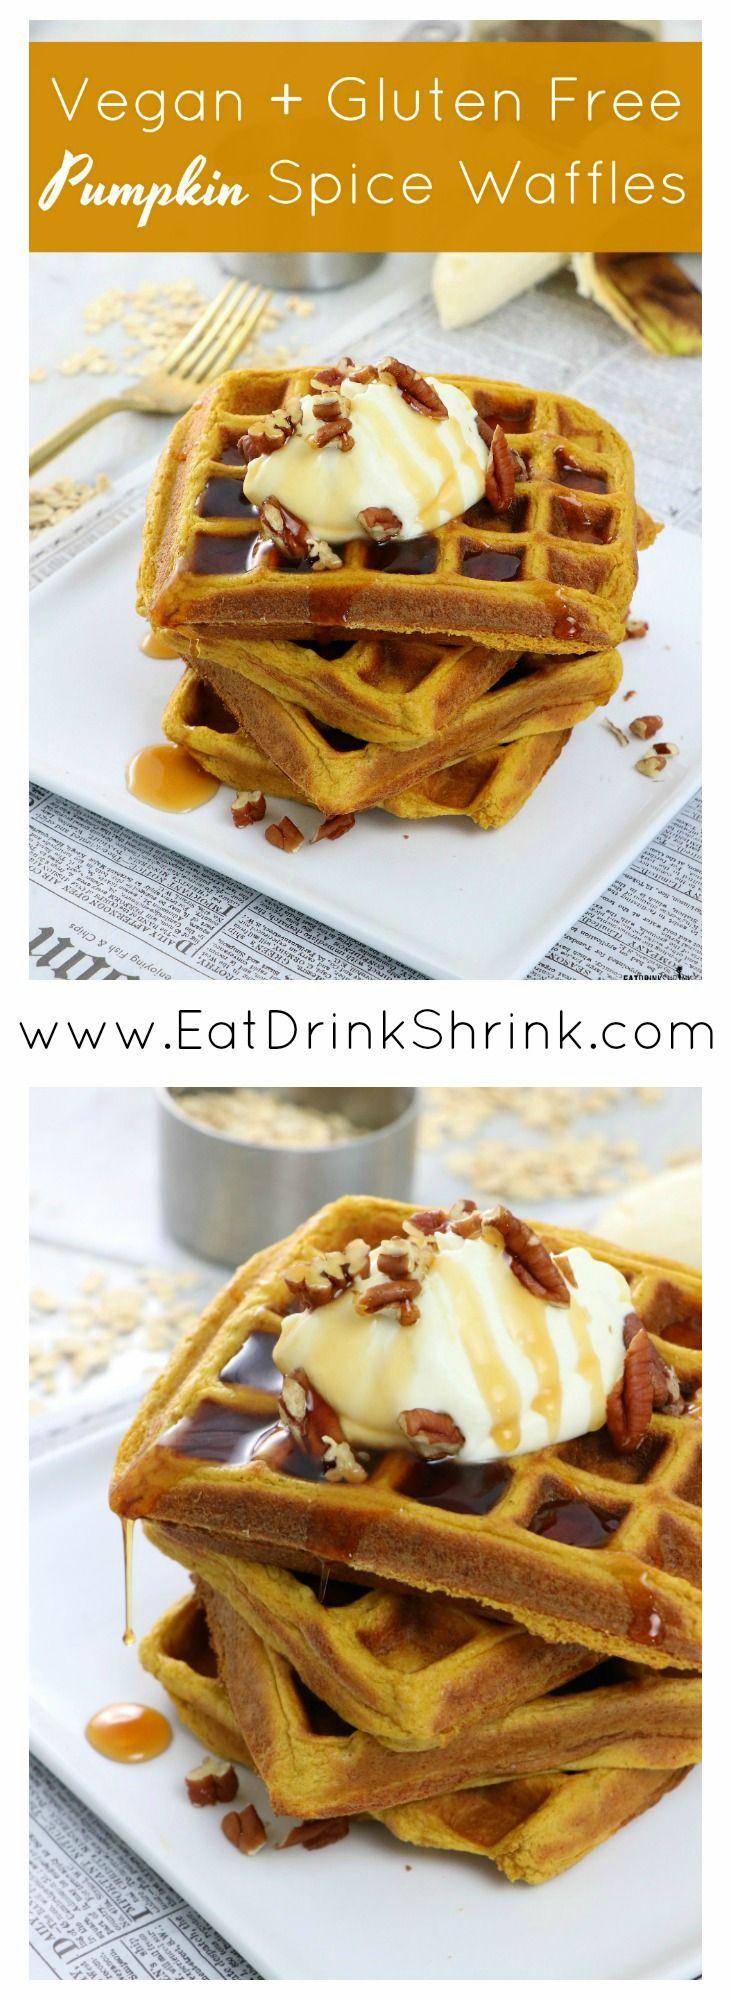 Vegan Gluten Free Pumpkin Spice Waffles Recipe Pumpkin